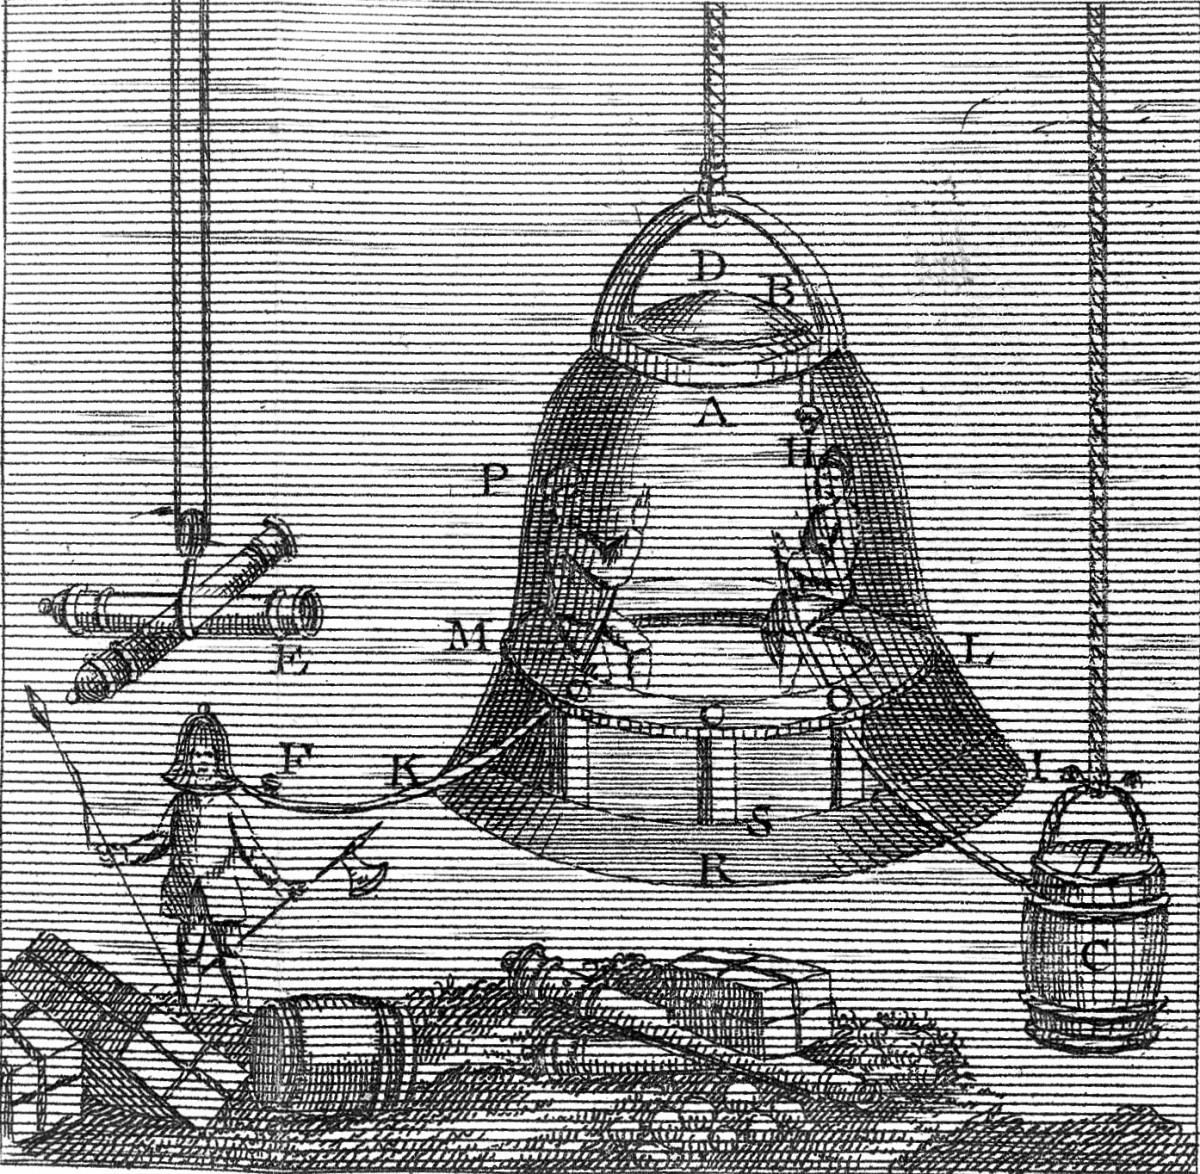 Illustration of Halley's diving bell